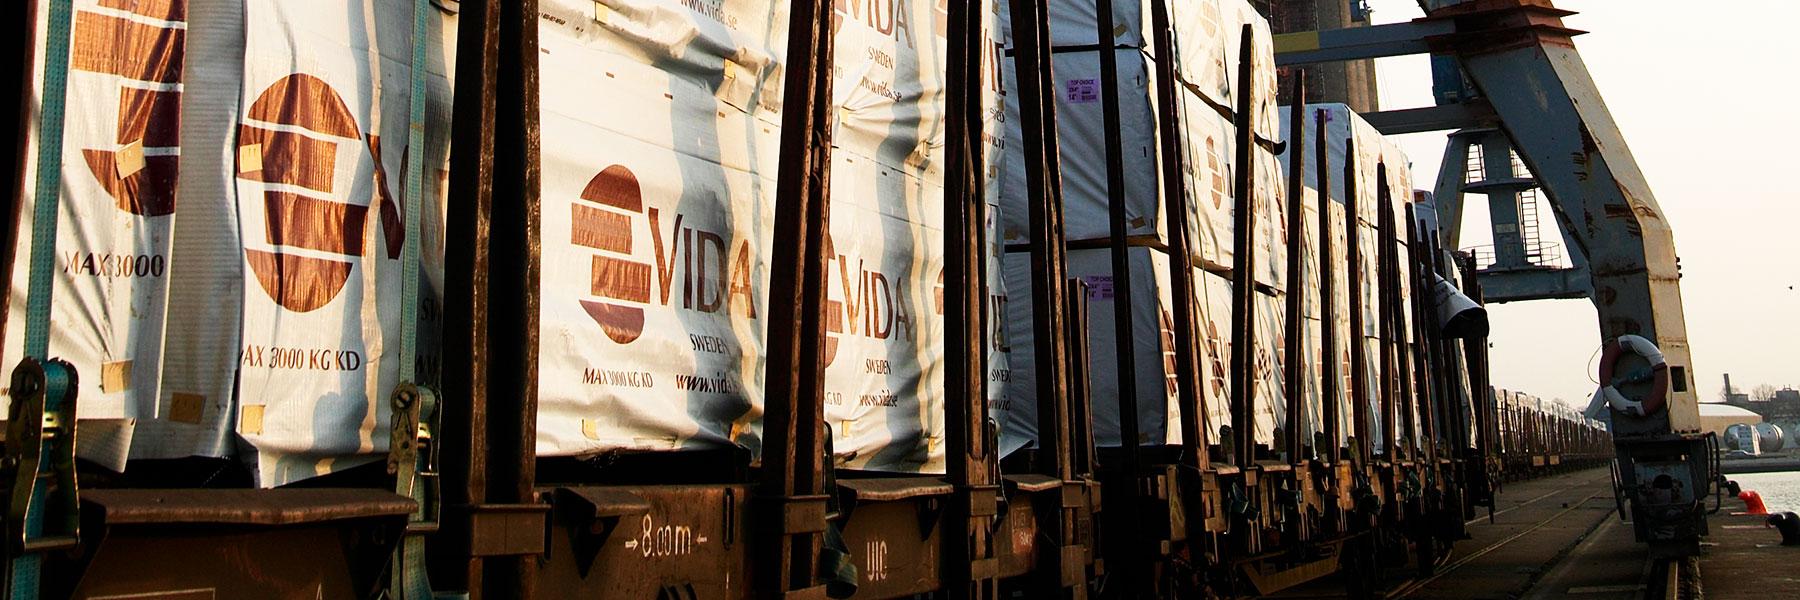 Vida's logistics system